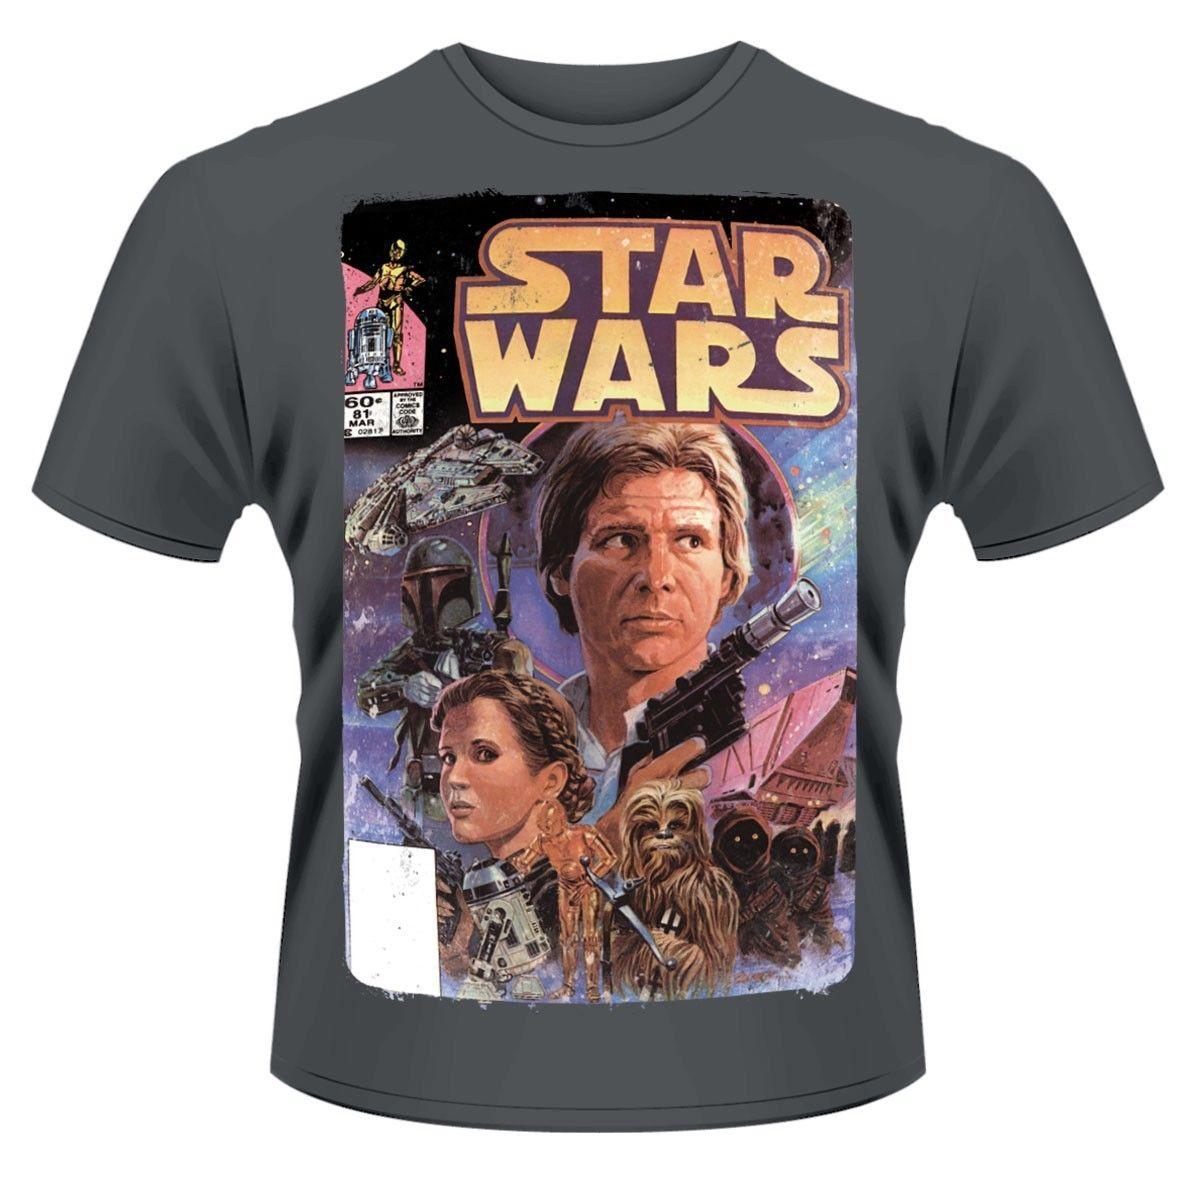 Star Wars Comic T-Shirt - NEW  Free shipping Harajuku Tops Fashion Classic Unique Cotton O-Neck T Shirt free